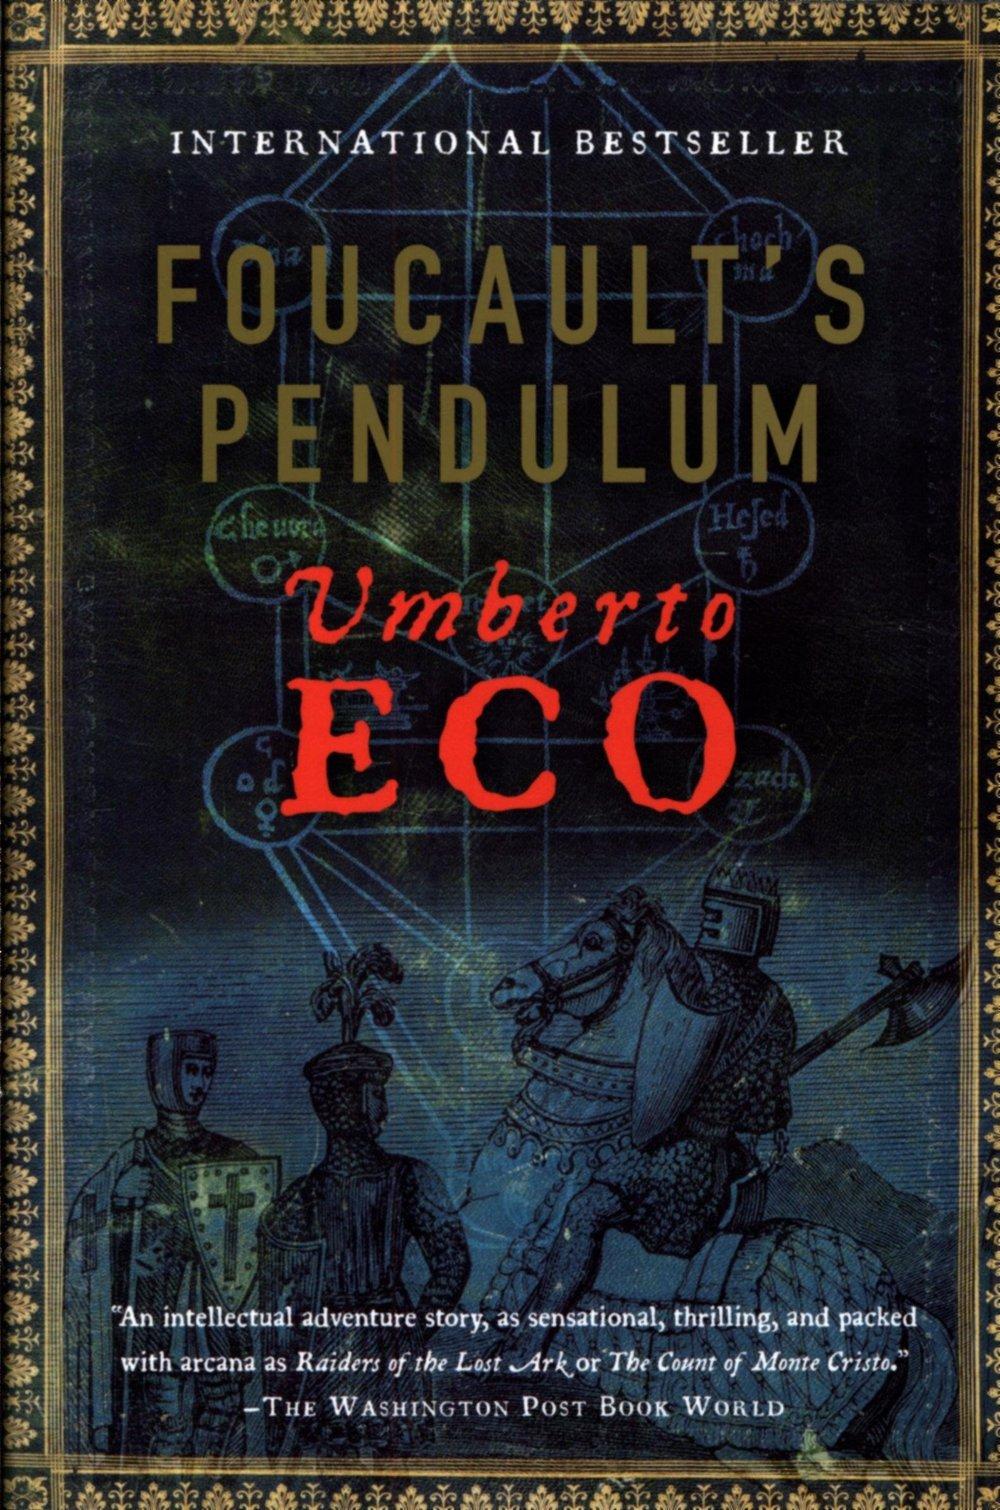 Book Review: Foucault's Pendulum by Umberto Eco